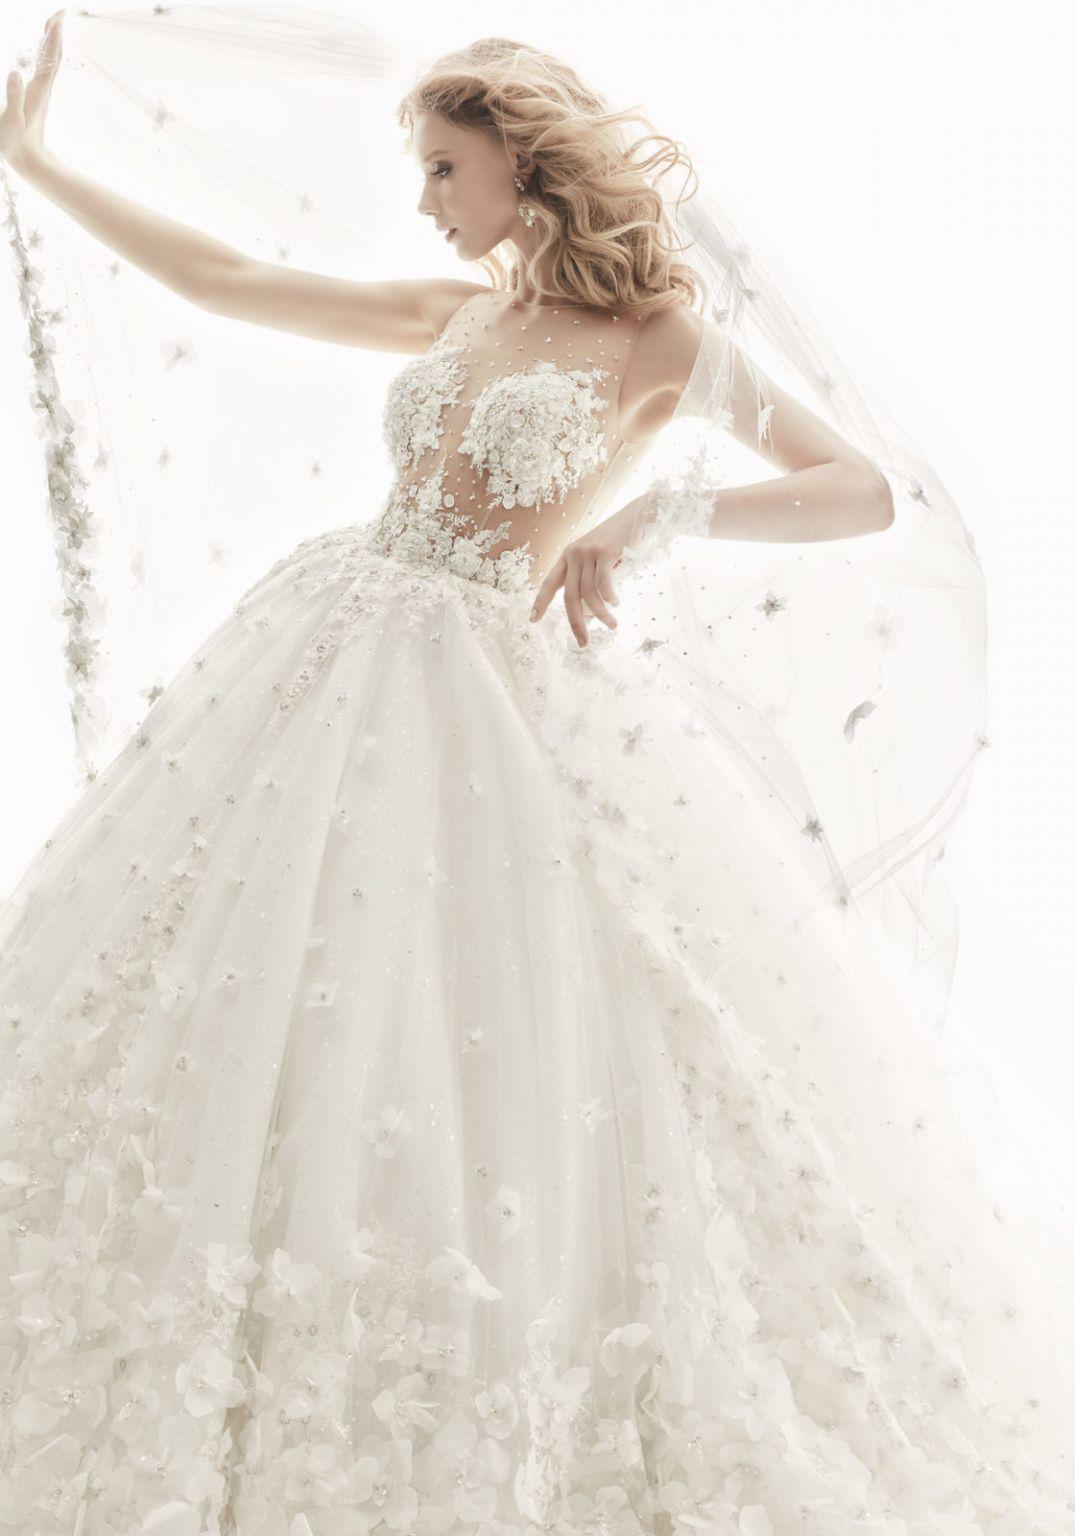 Randy Fenoli Brandi Wedding Dress New, Size 4, 2,900